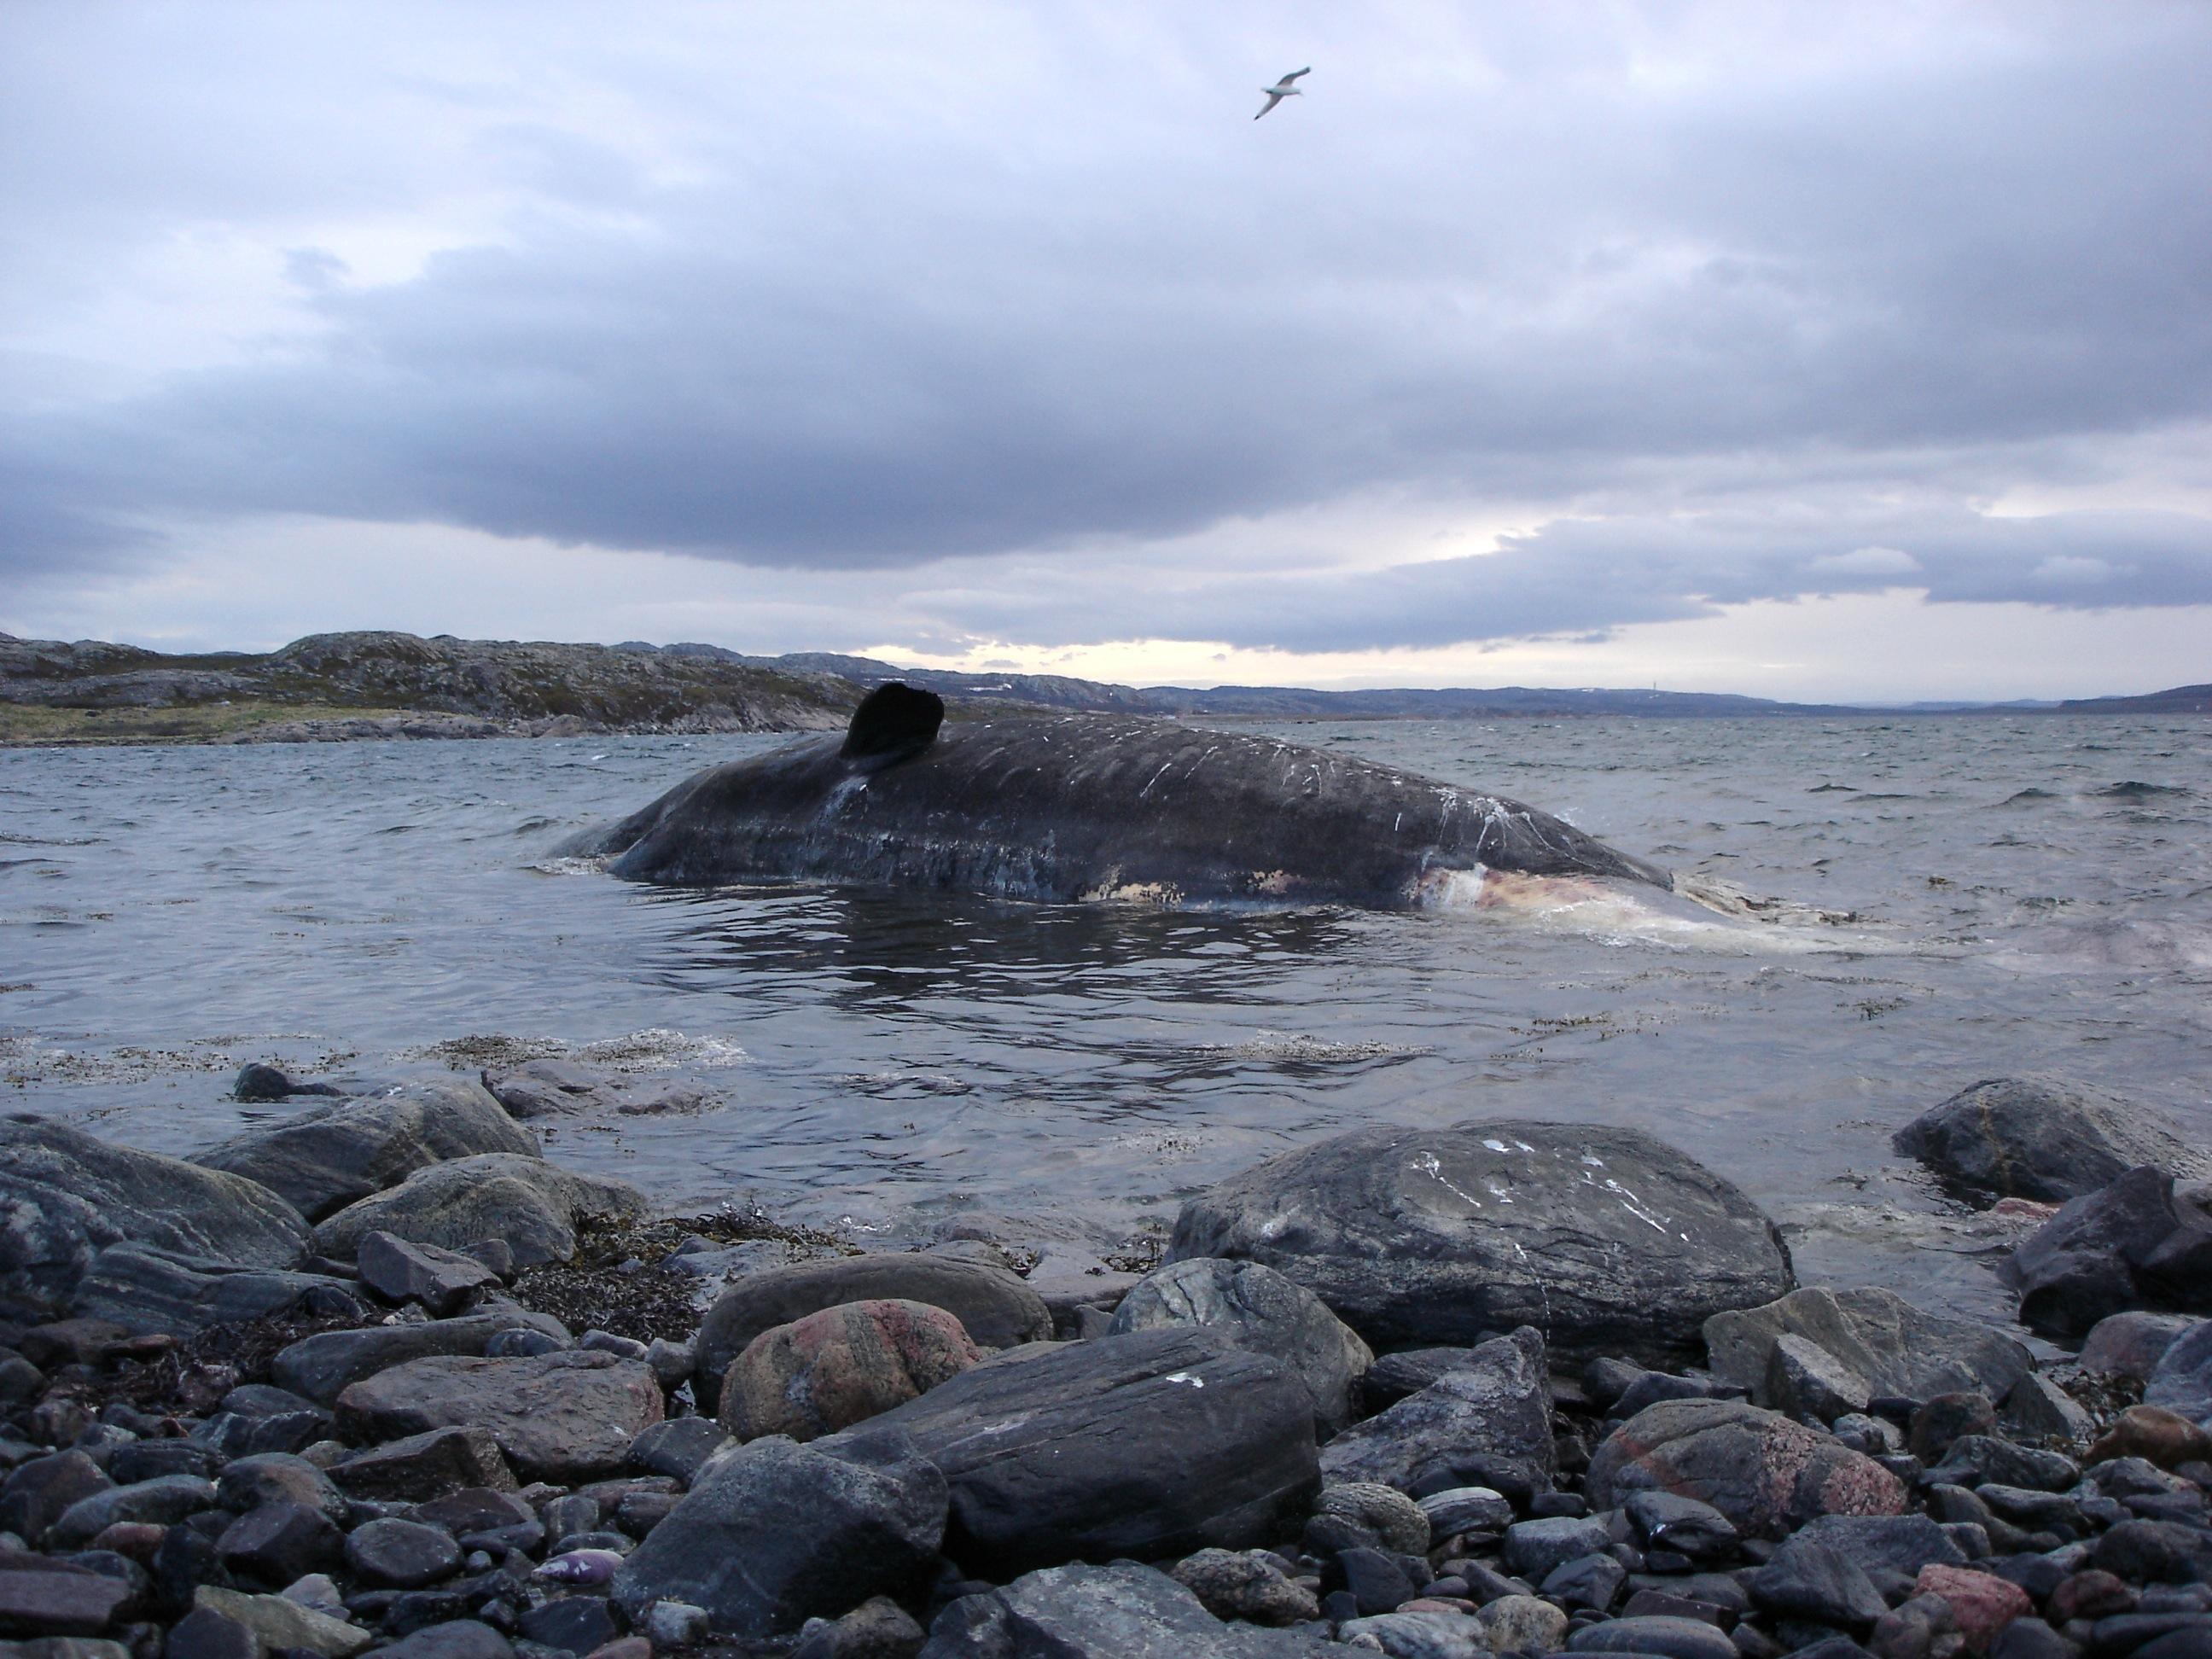 A dead sperm whale on the Sámi coast, Norway, 2007